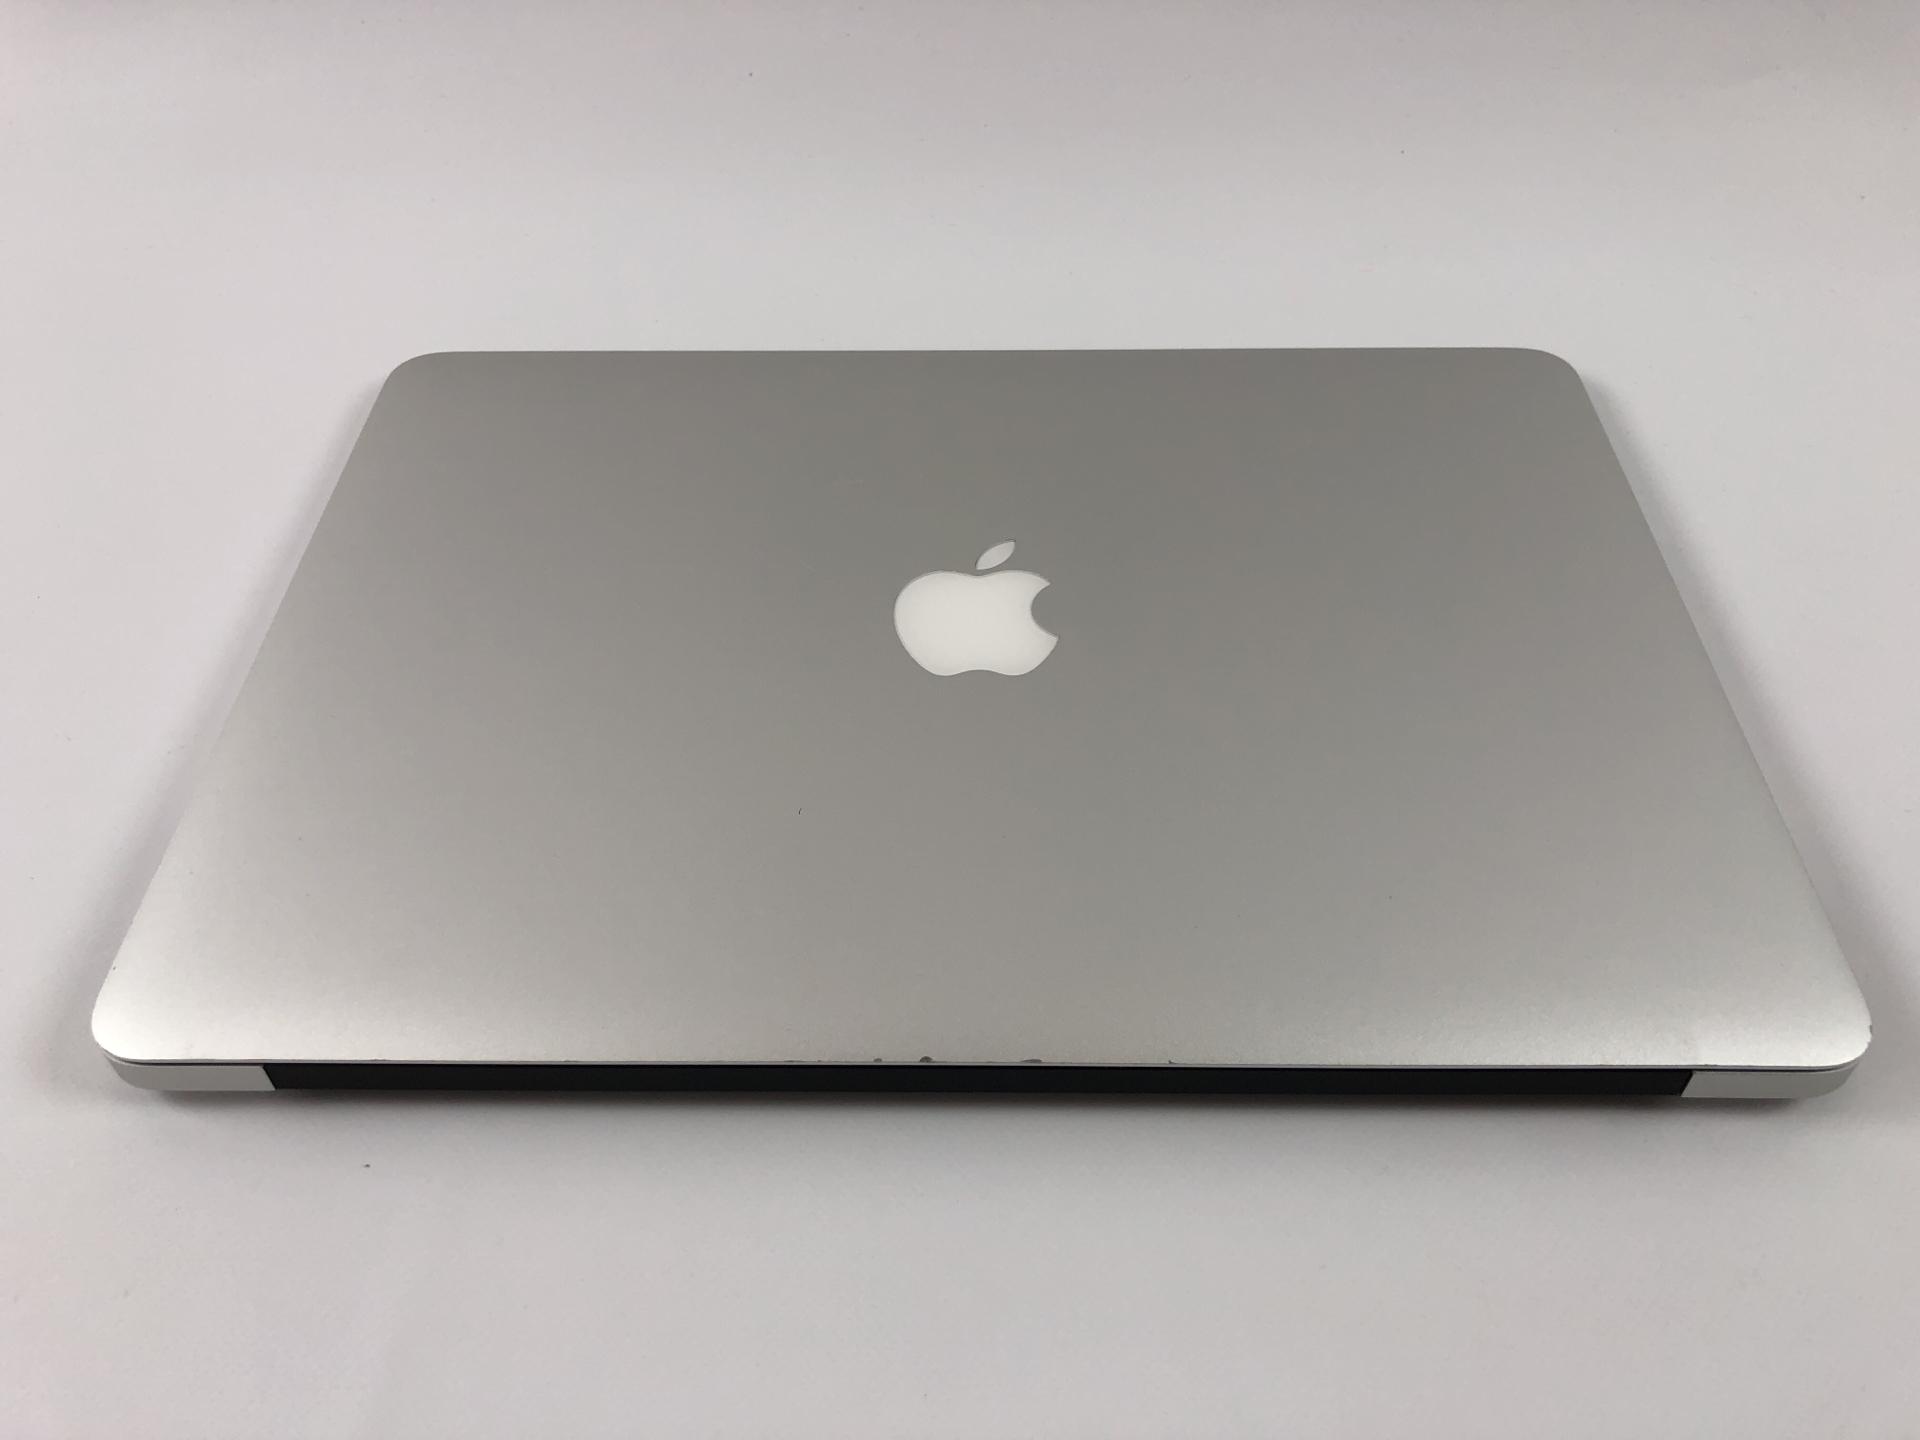 "MacBook Air 13"" Early 2014 (Intel Core i5 1.4 GHz 4 GB RAM 256 GB SSD), Intel Core i5 1.4 GHz, 4 GB RAM, 256 GB SSD, Kuva 2"